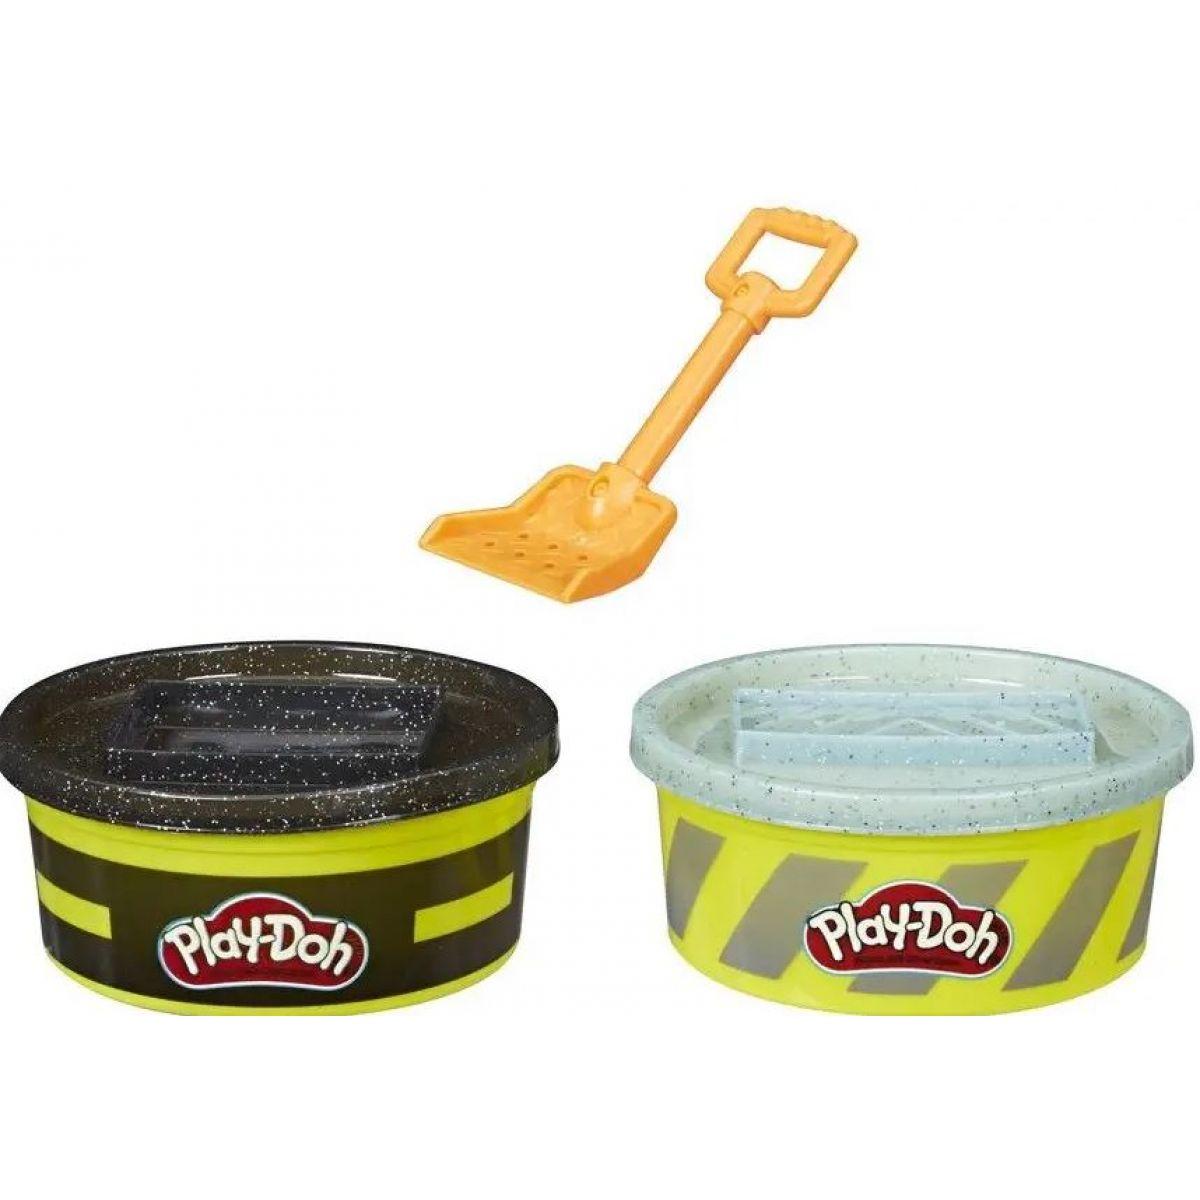 Play-Doh Wheels Stavební modelína černá, šedá